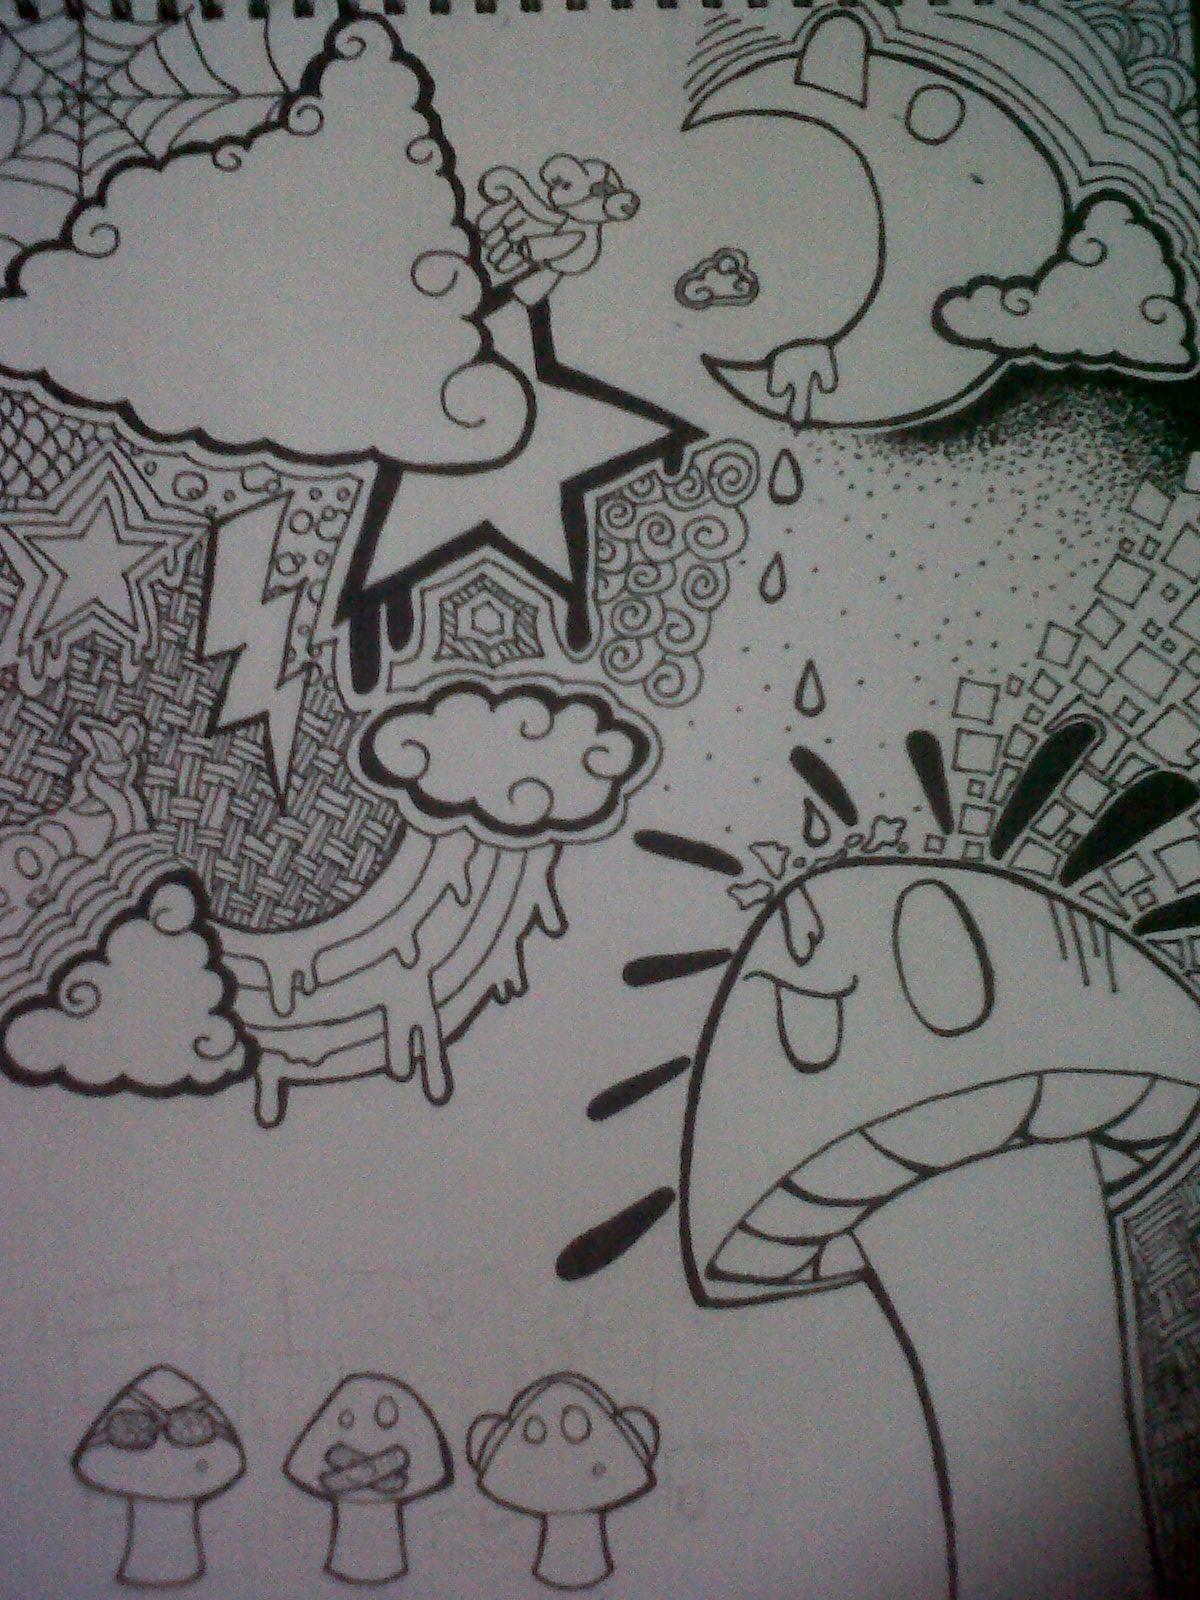 Art4life Doodles